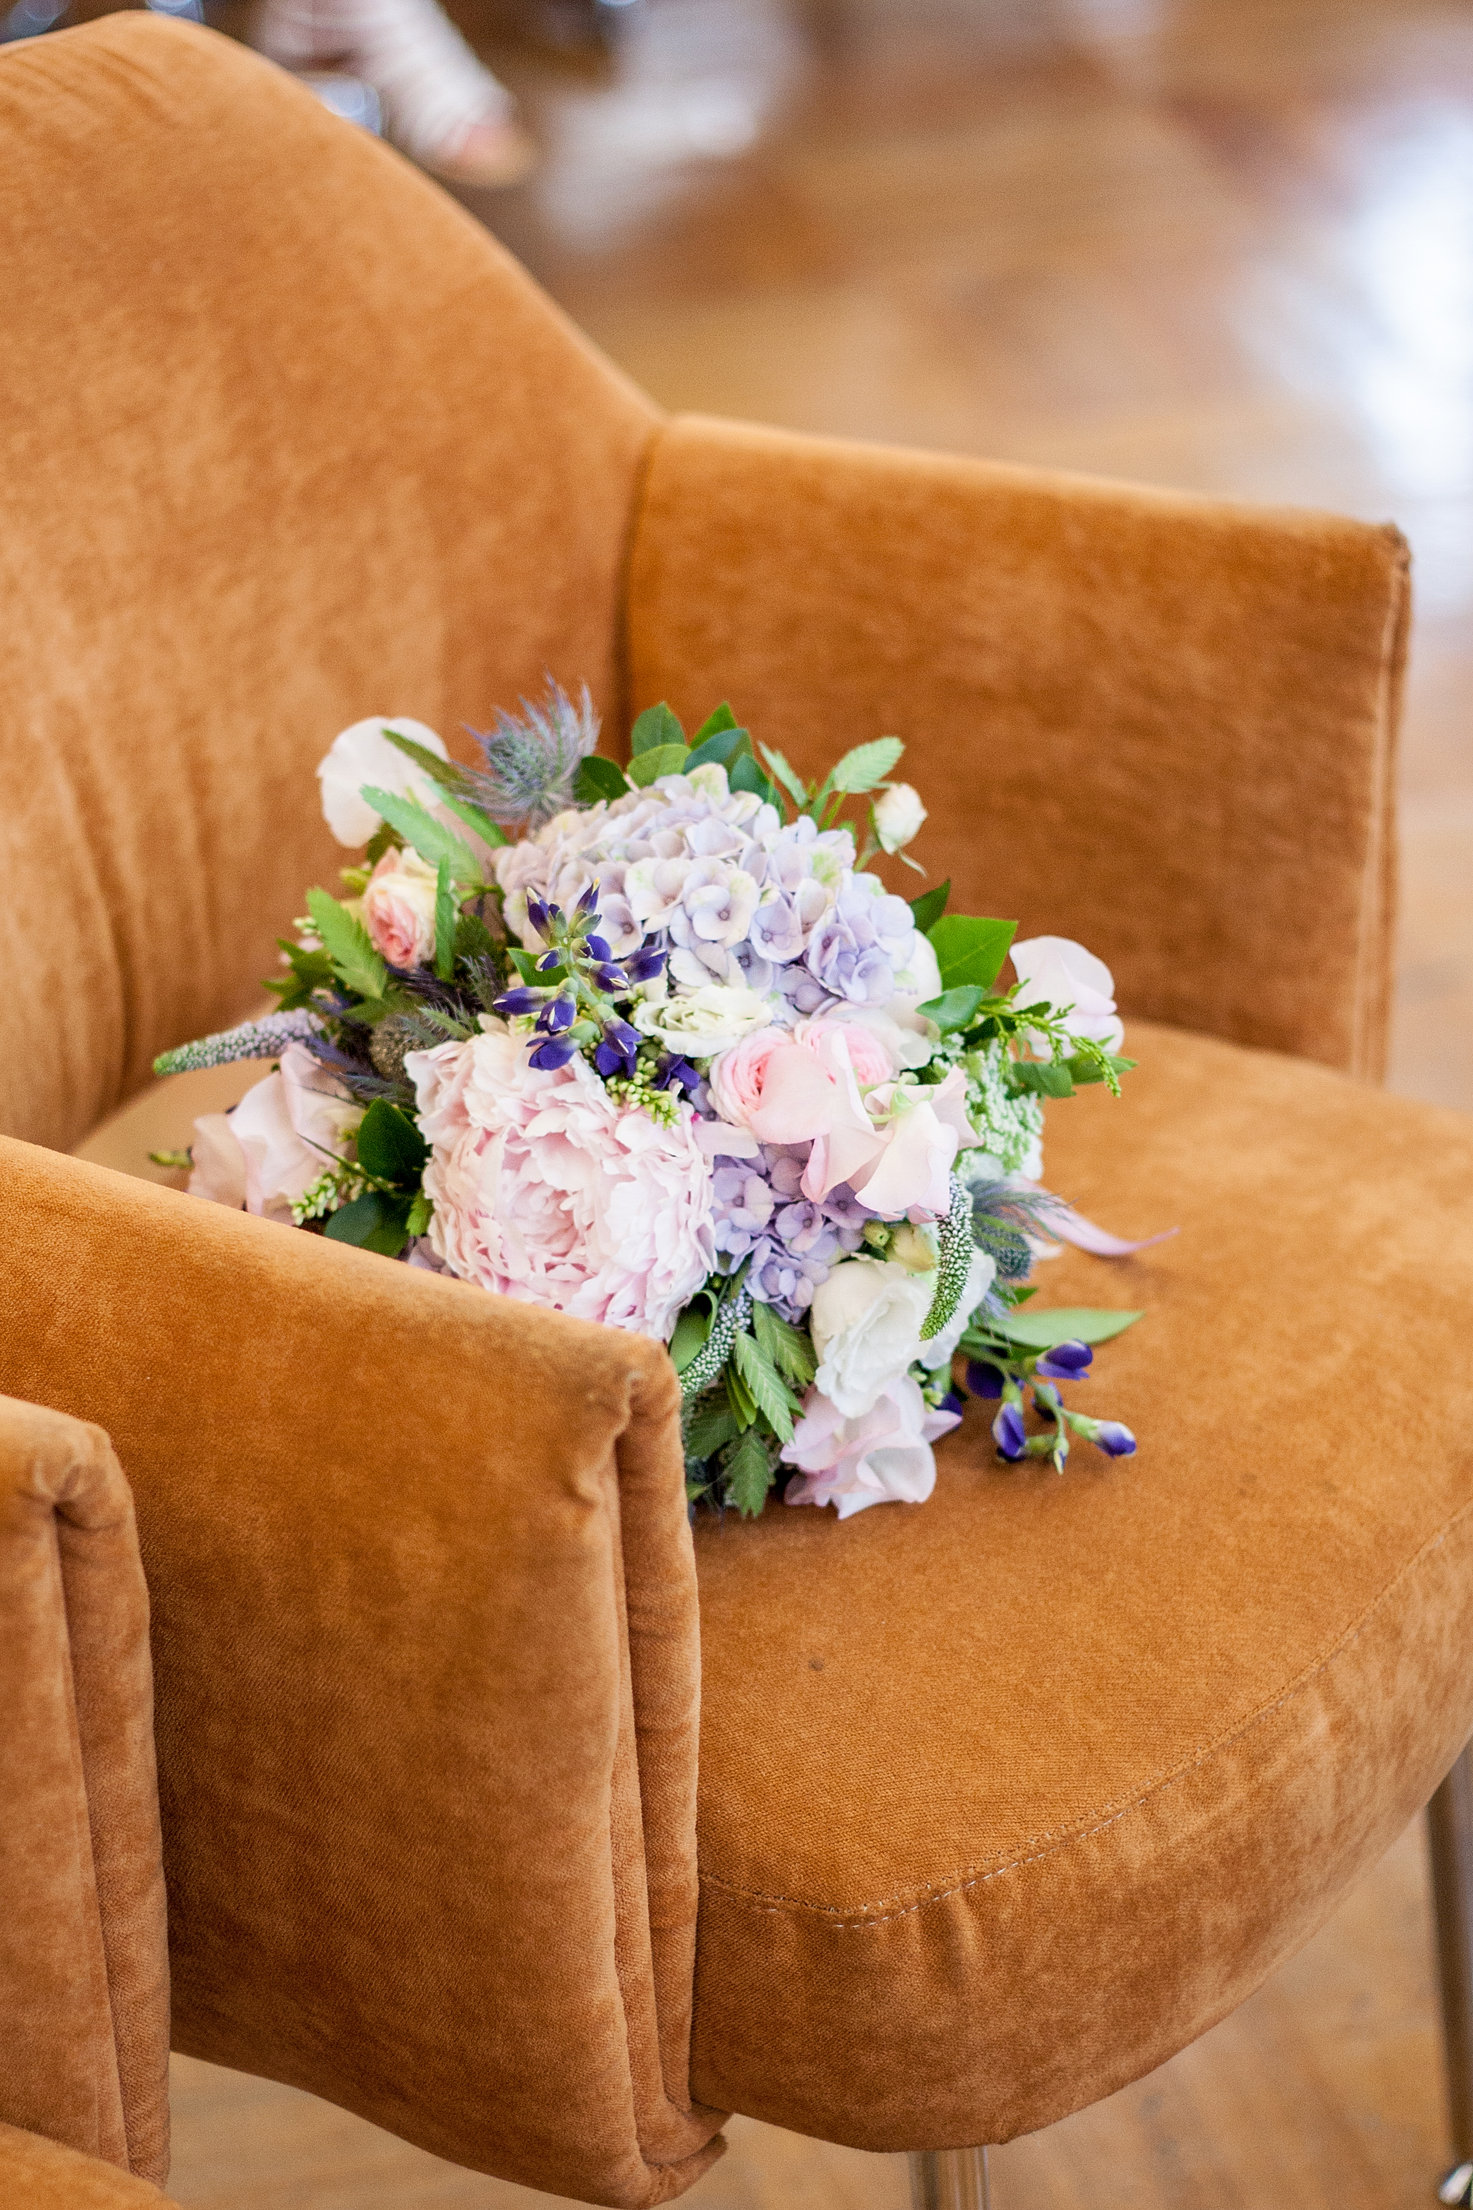 photographe roubaix mariage - Photographe Mariage Tourcoing